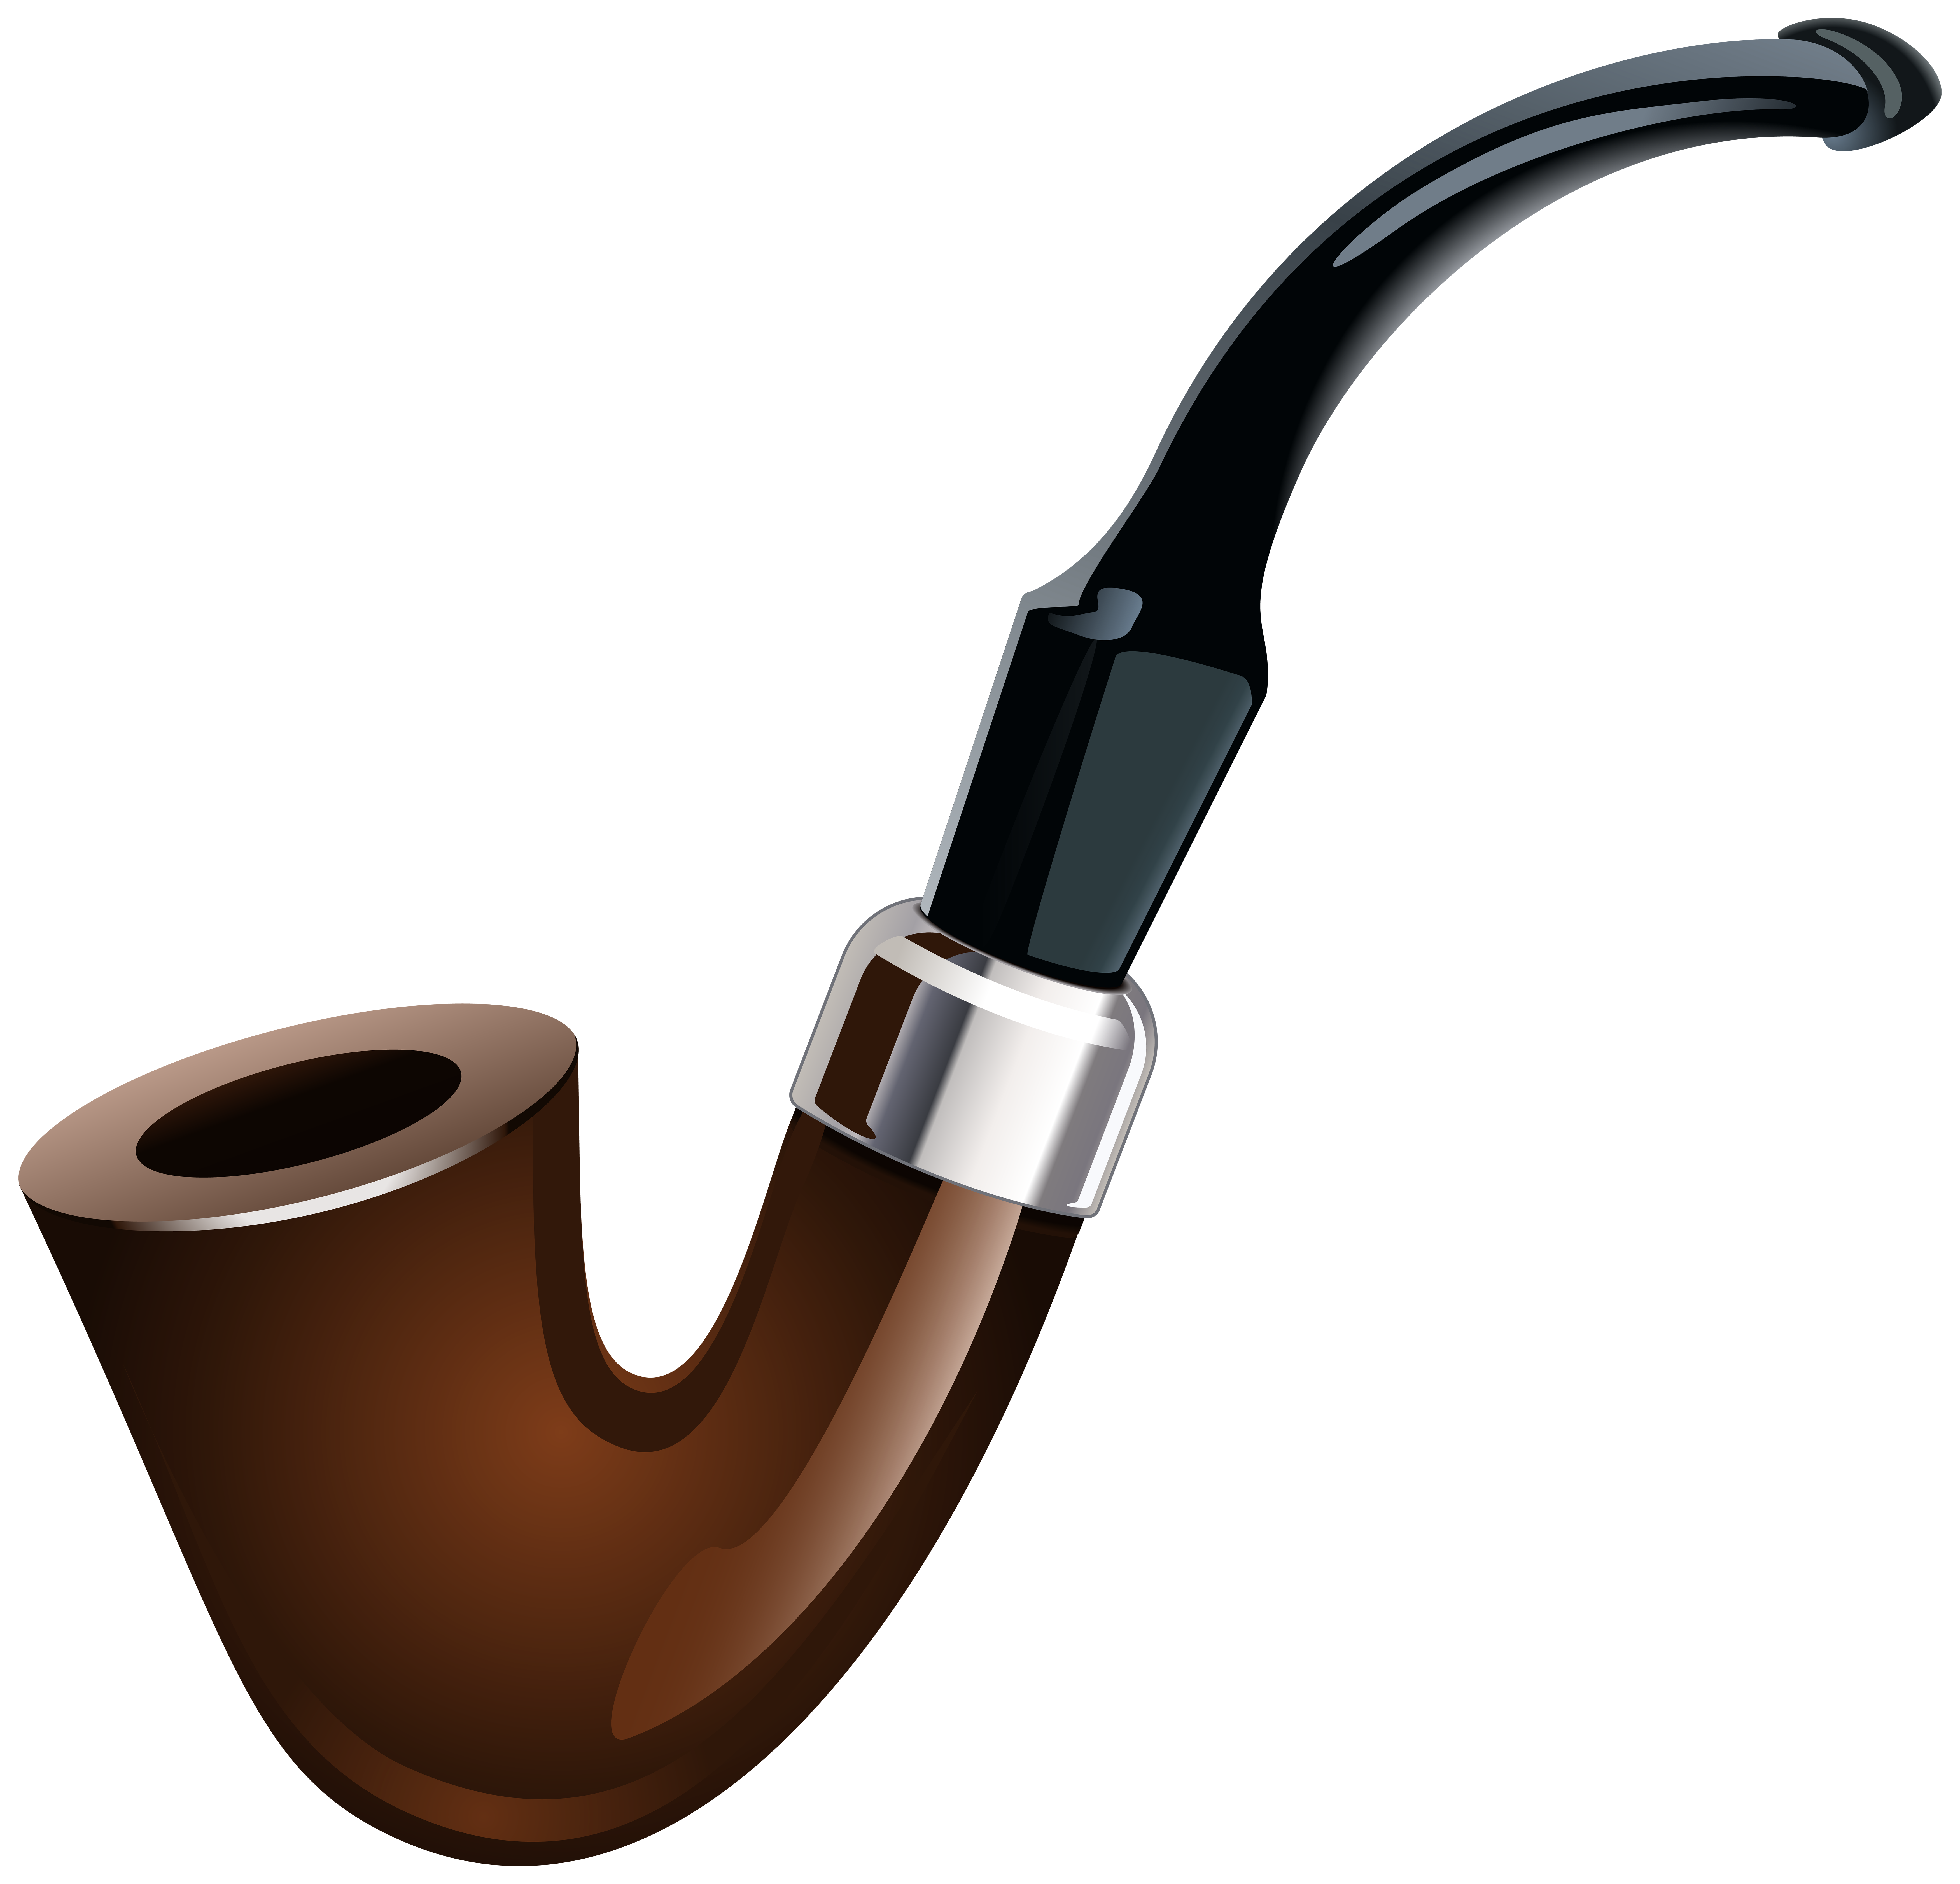 Cigar clipart smoking pipe Clip Art Pipe Pipe Art